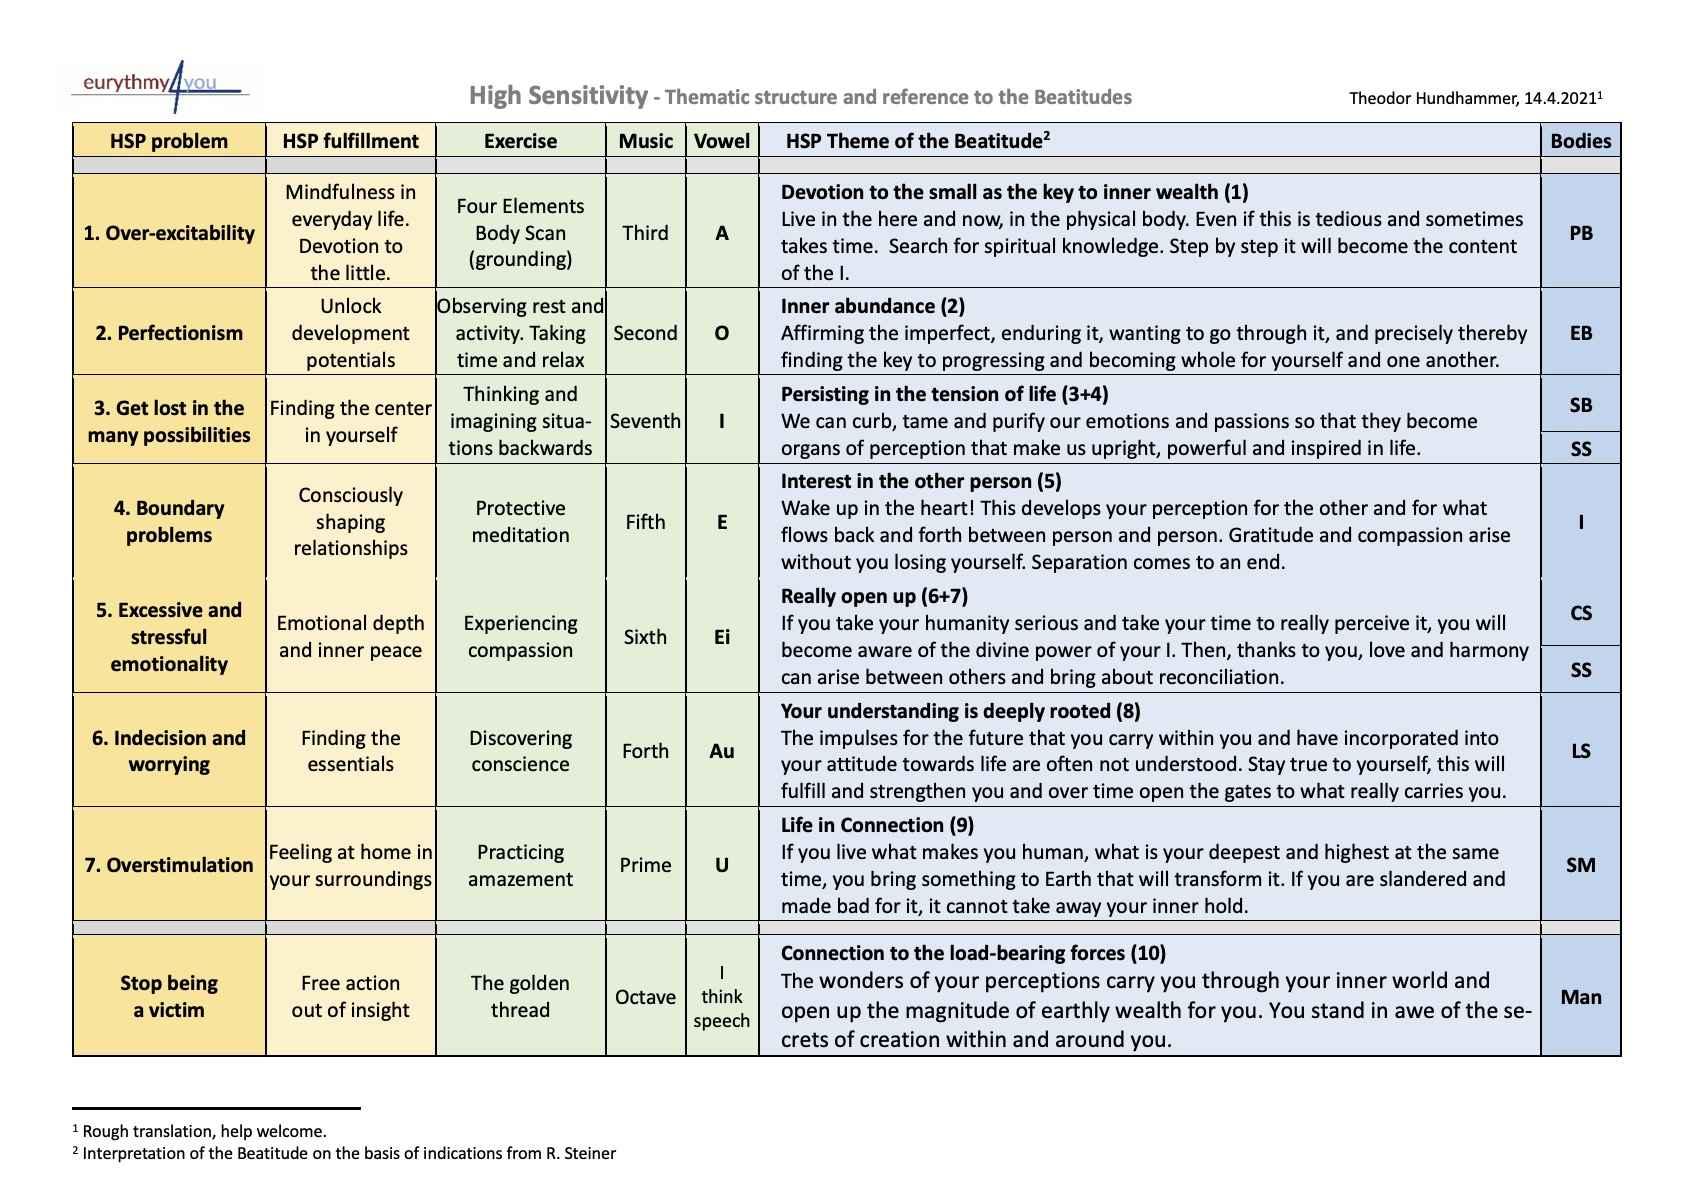 High Sensitivity - Structure and Beatitude